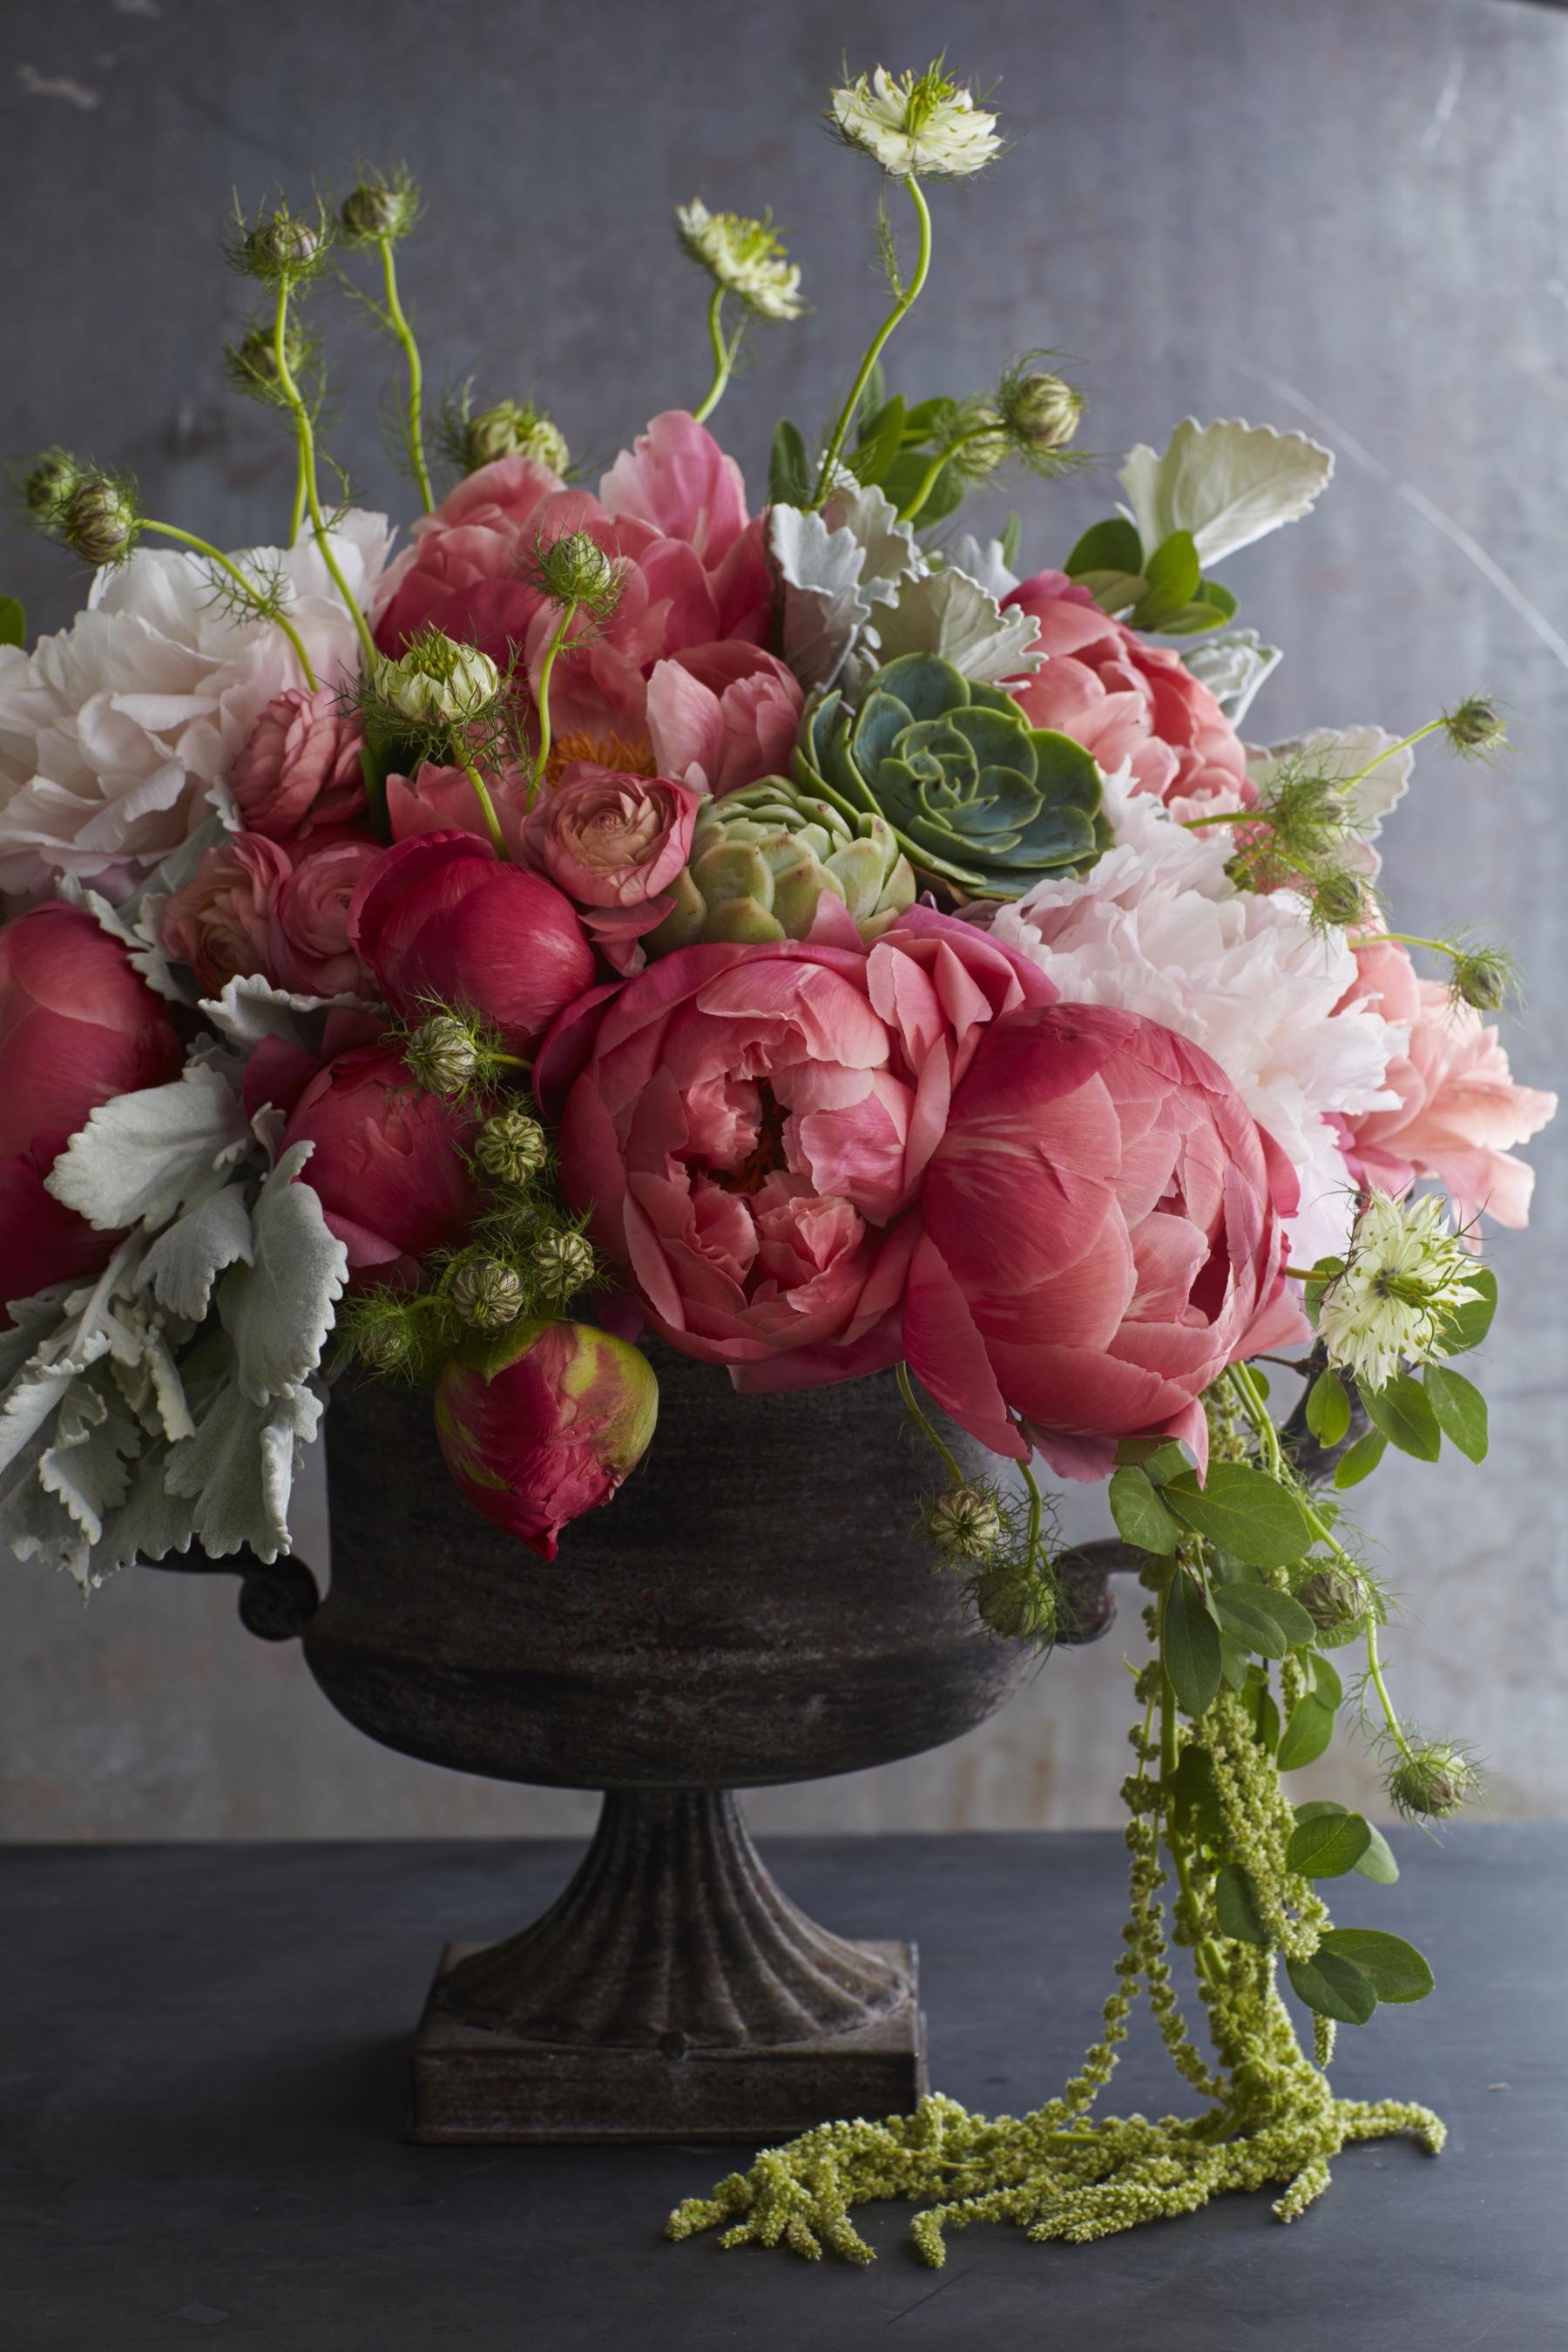 handley breaux designs   buffy hargett    floral tastemaker   birminghan wedding planner